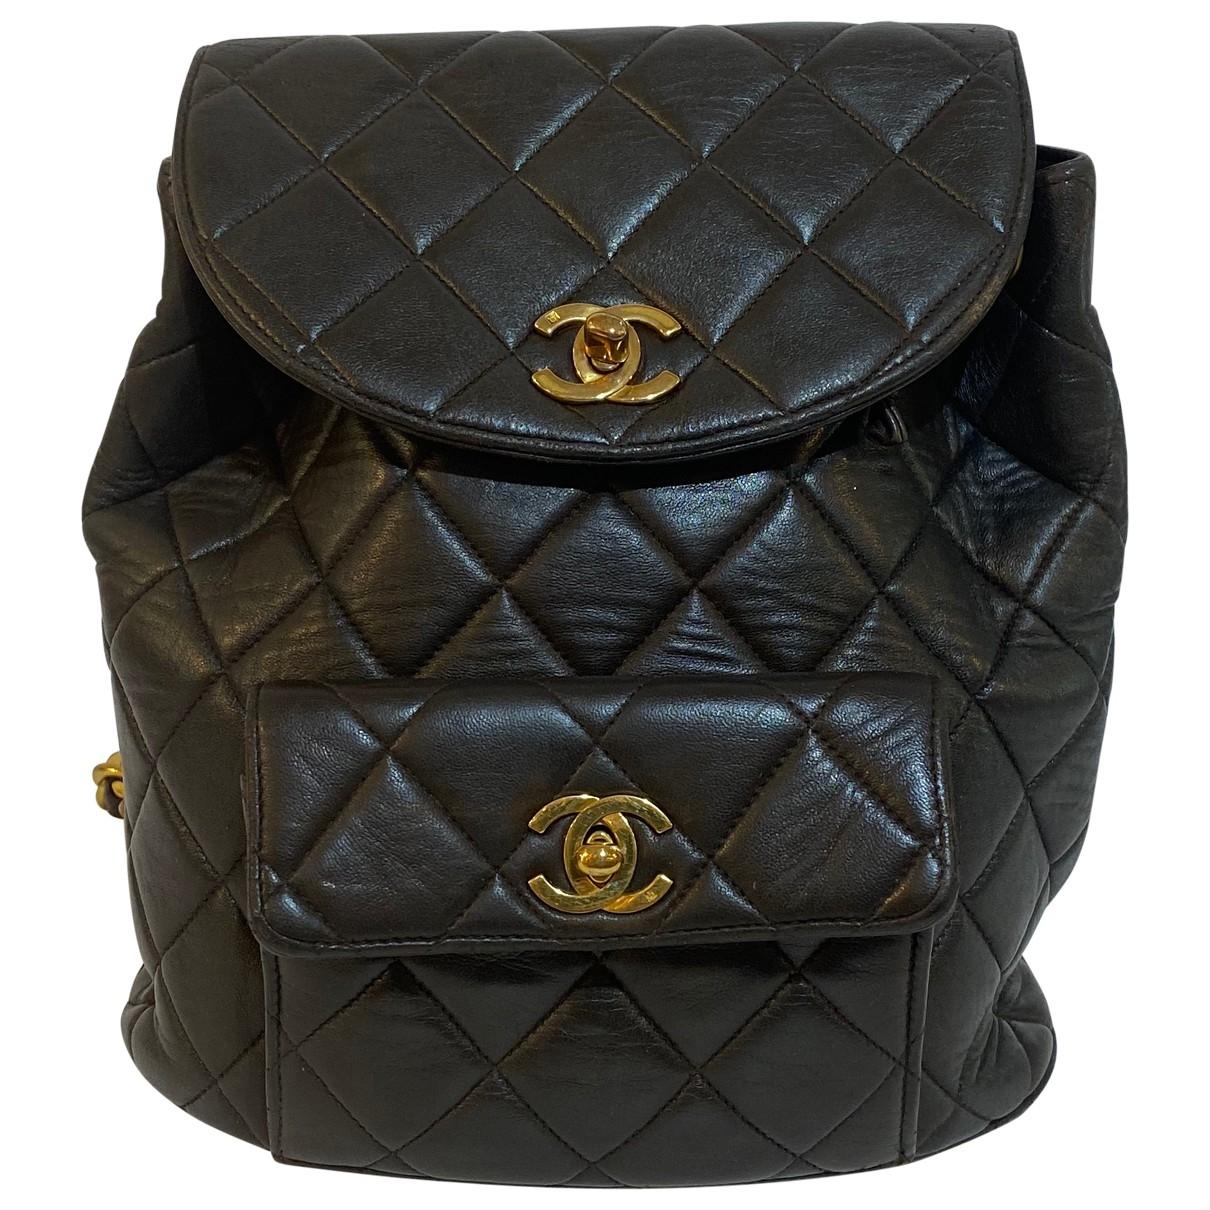 Chanel - Sac a dos Duma pour femme en cuir - marron